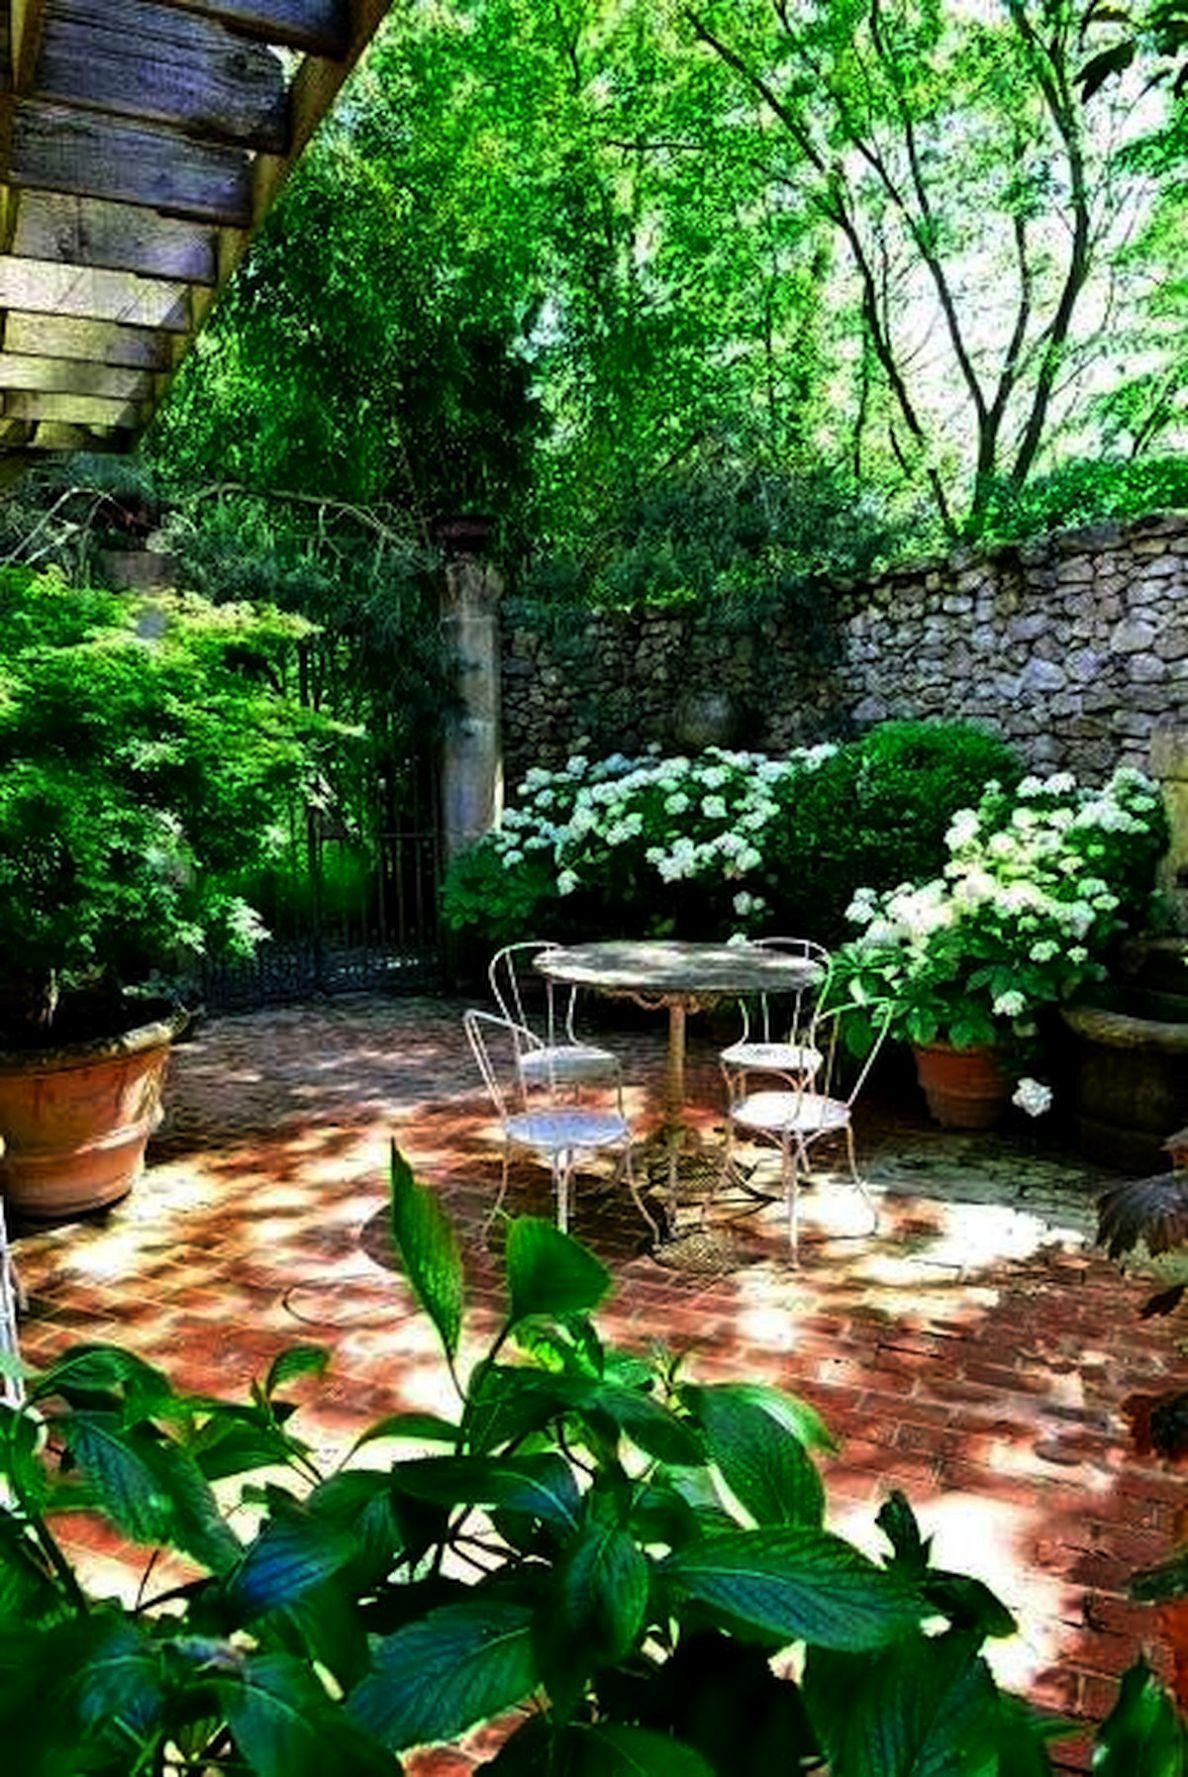 Garden Landscape Design Hampshire Garden Landscape Design Ideas Youtube Courtyard Gardens Design Garden Seating Area Small Courtyard Gardens